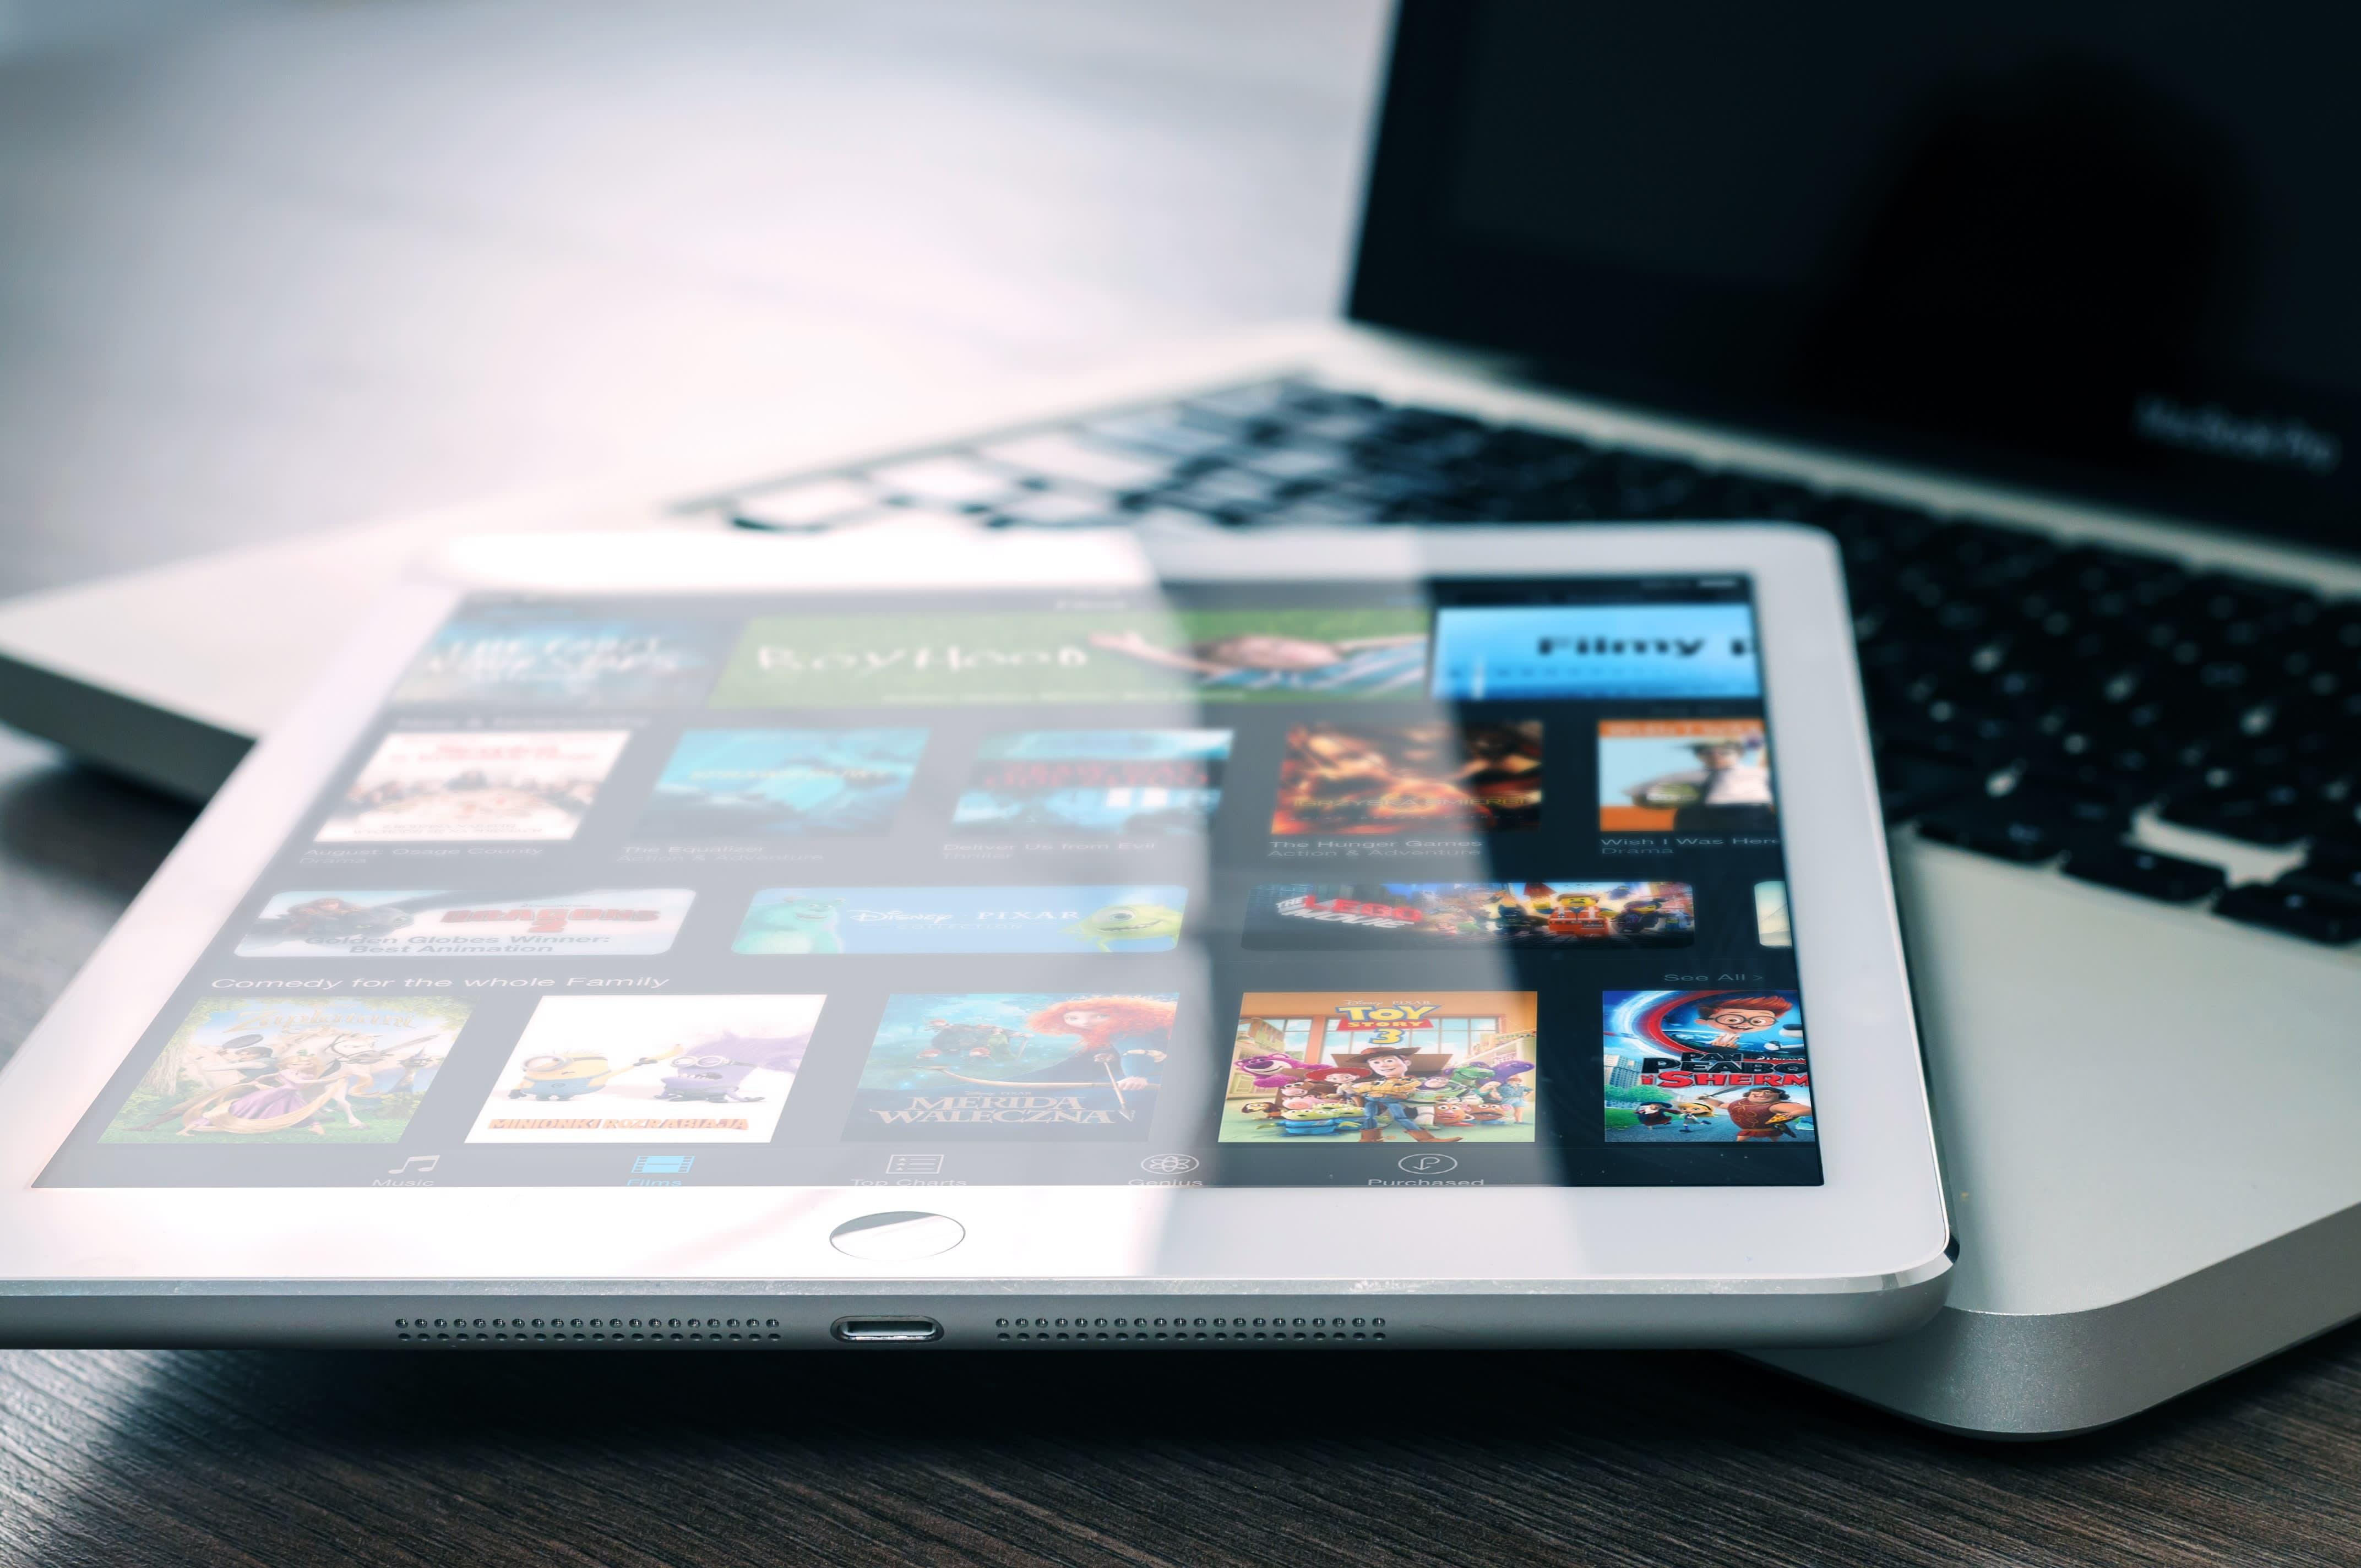 Octopus platform to be 'like using smartphone'